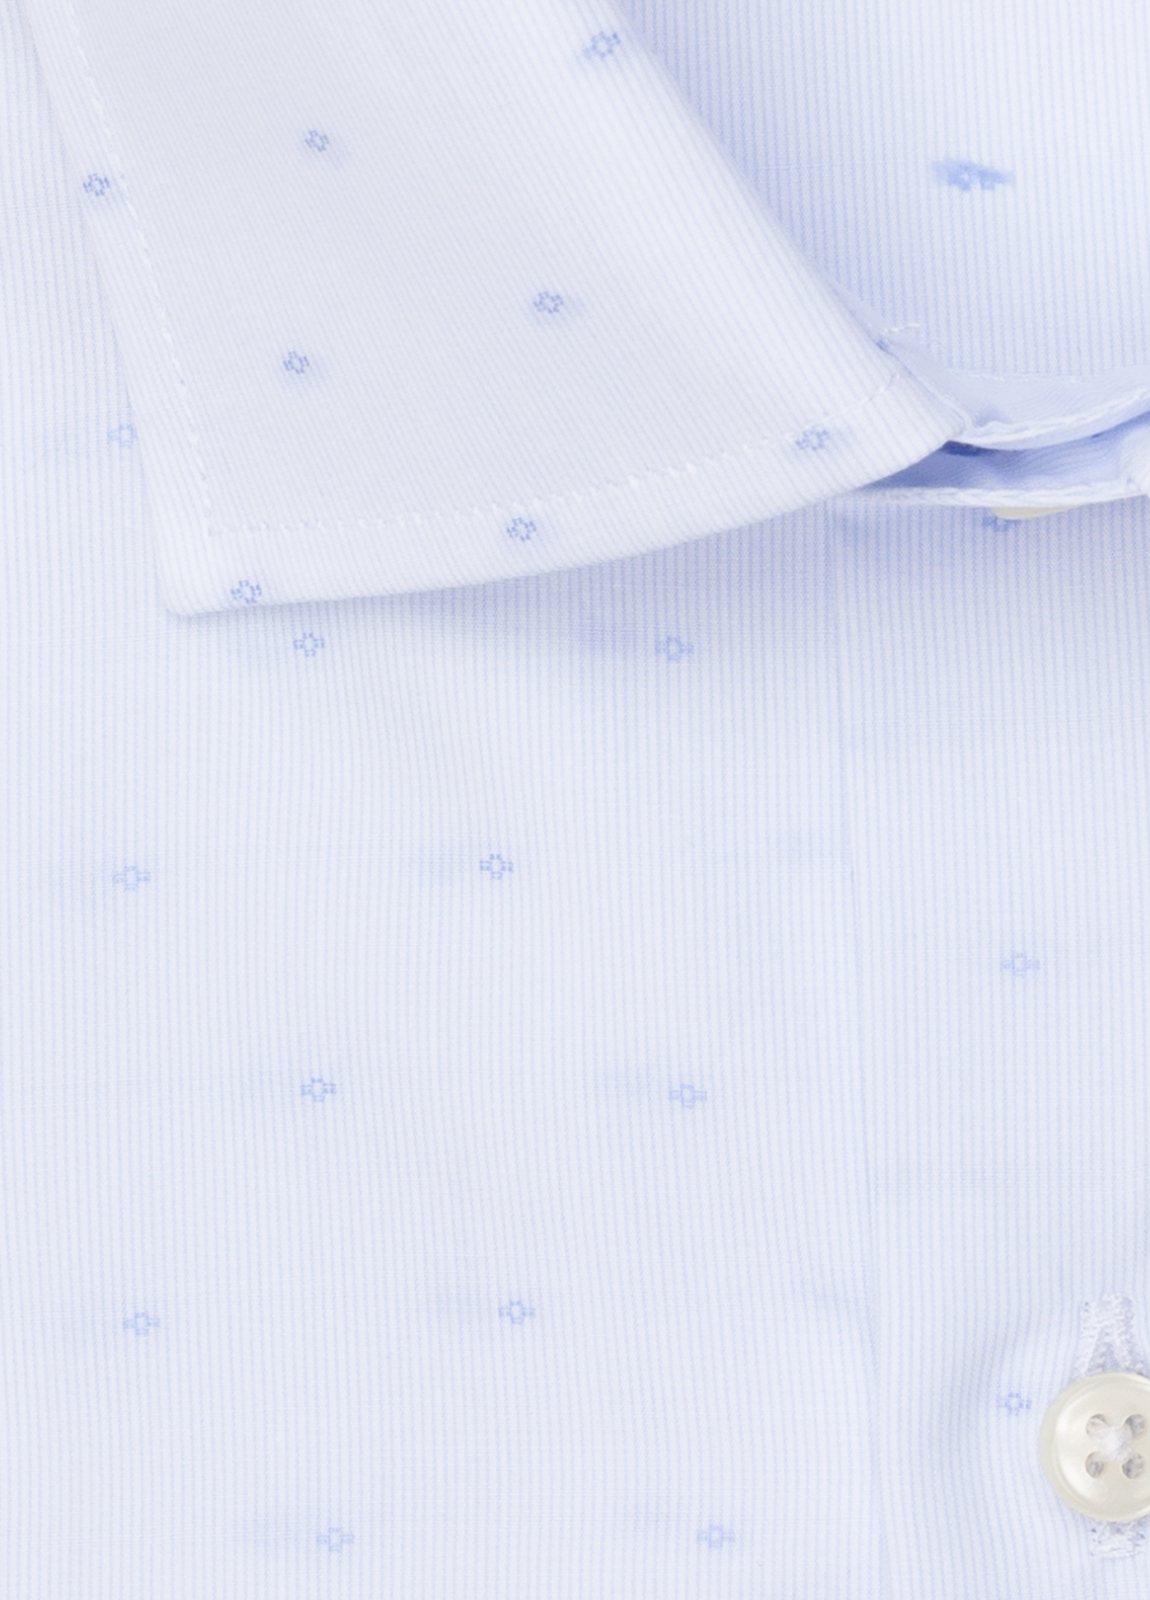 Camisa vestir SLIM FIT cuello italiano Fil Coupé dibujo geométrico - Ítem2